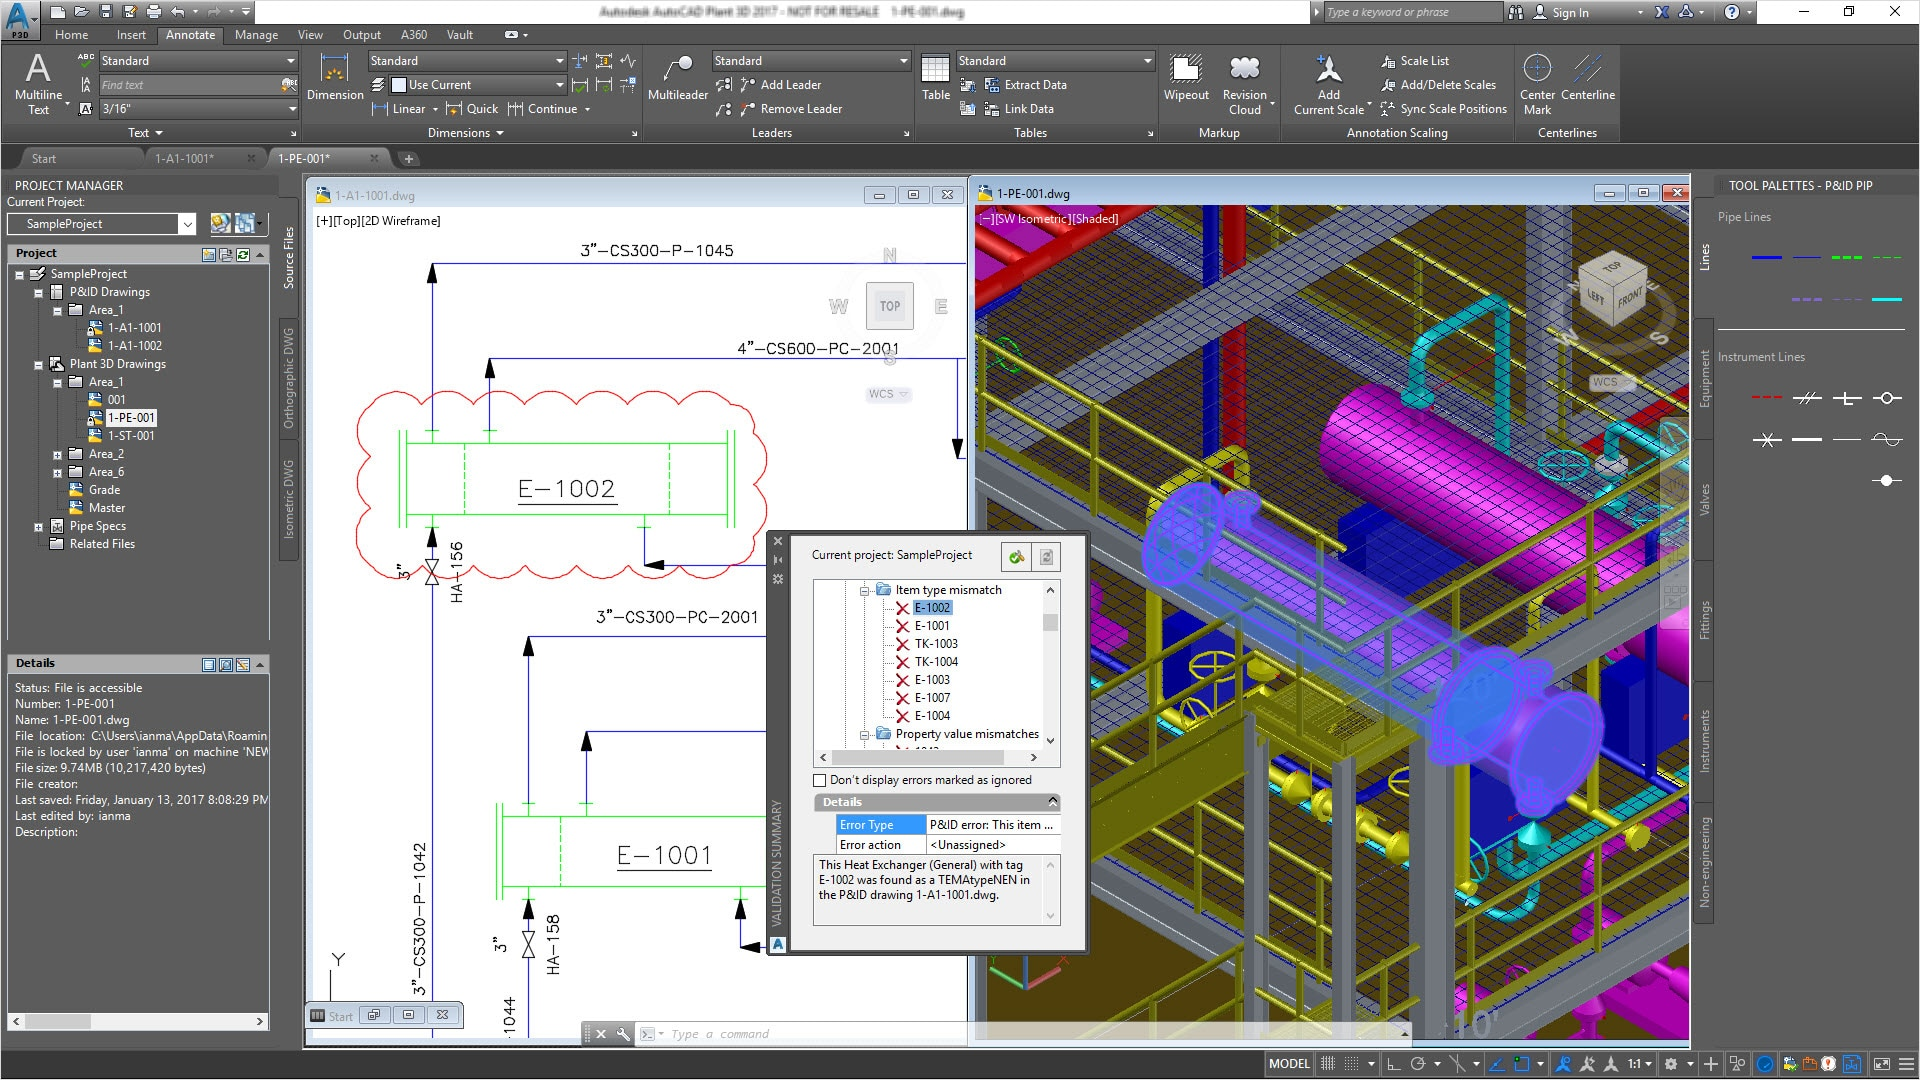 Autocad plant 3d toolset 3d plant design software for 3d cad software